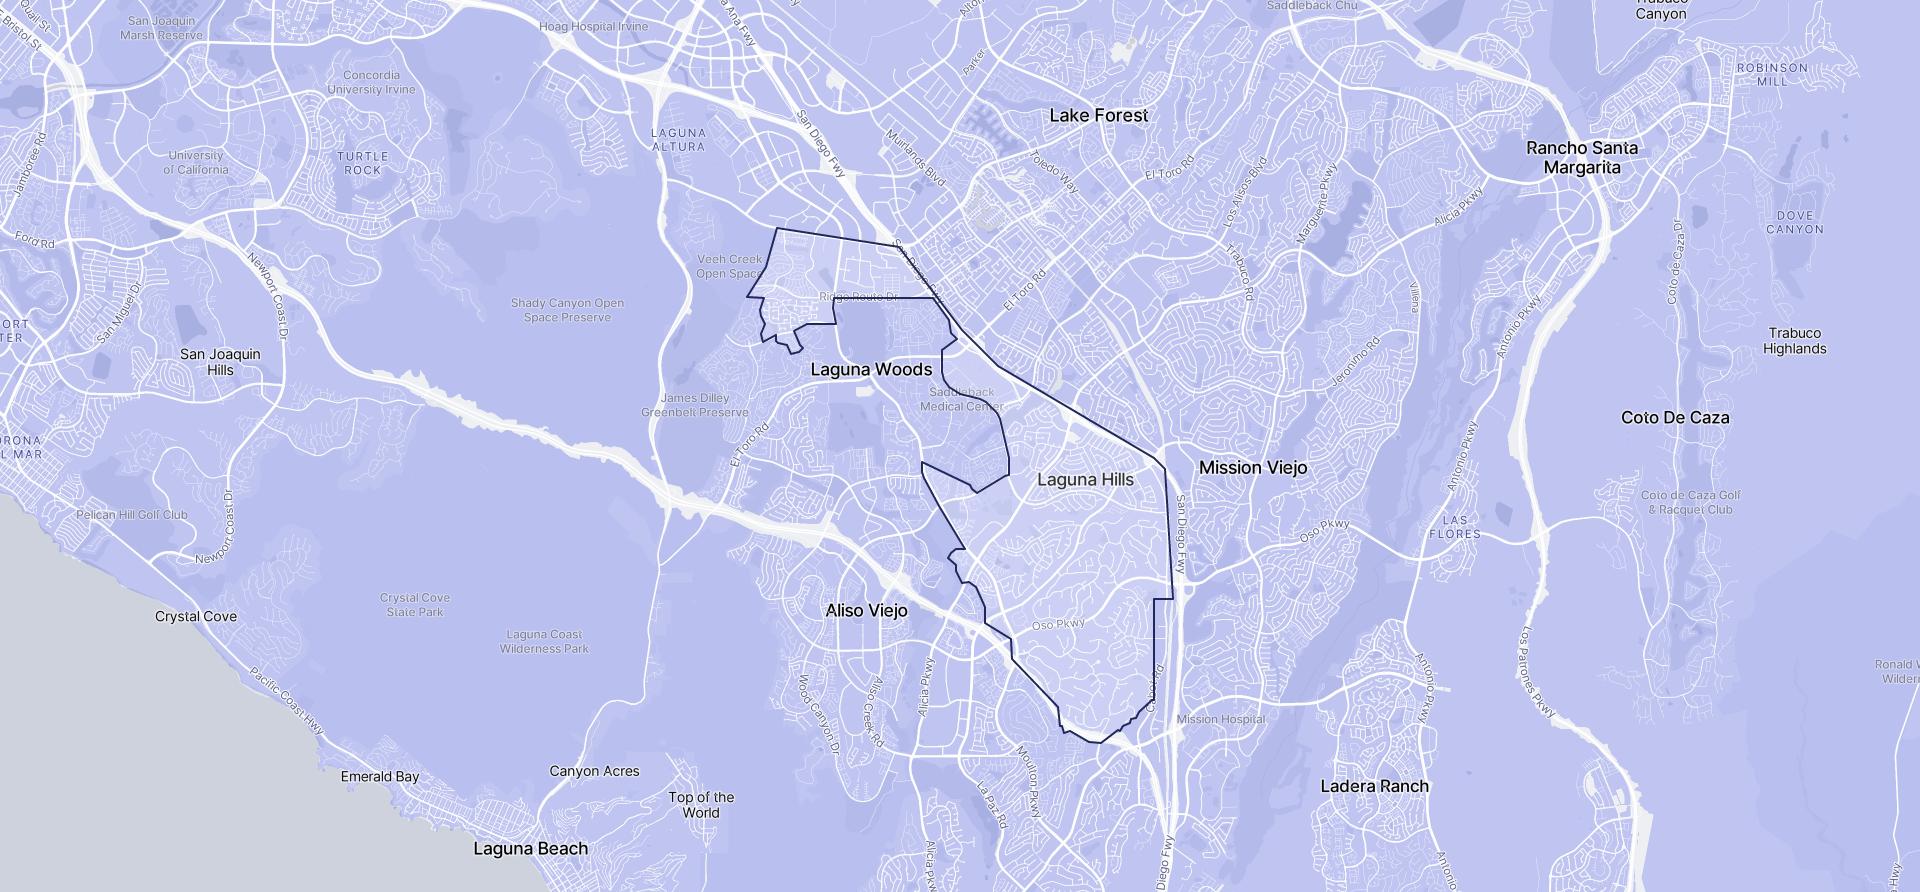 Image of Laguna Hills boundaries on a map.